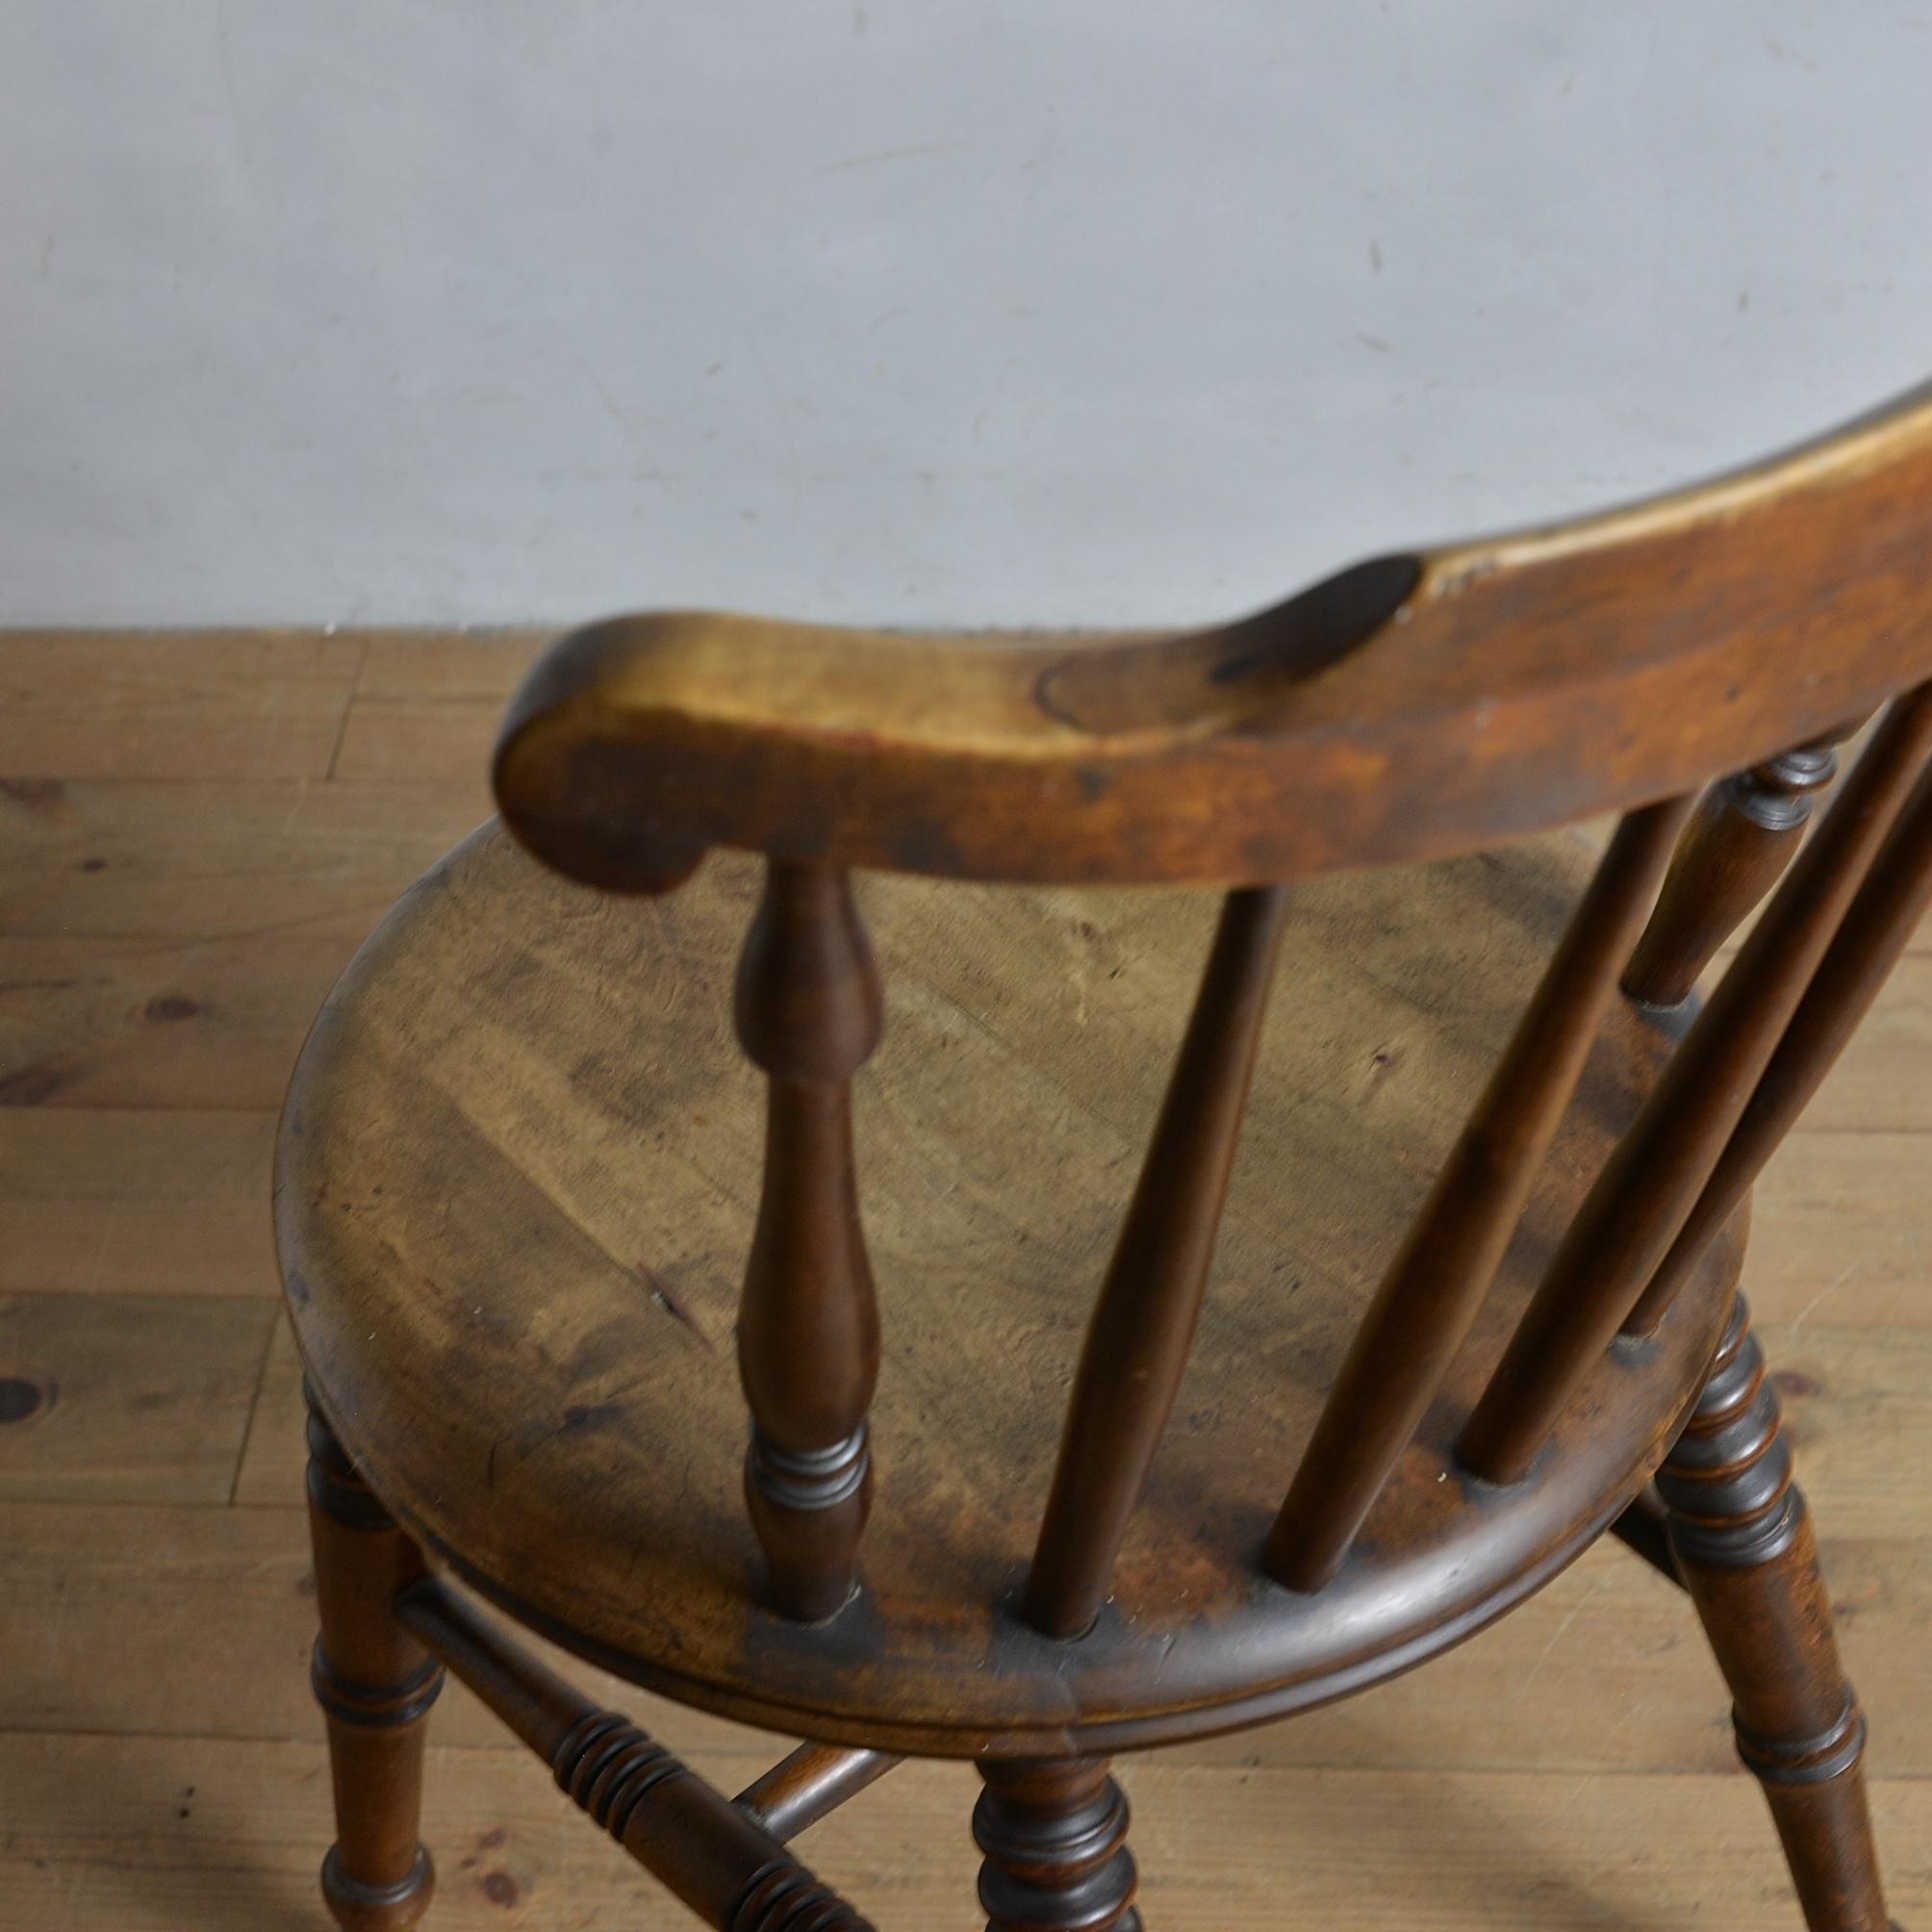 Ibex Chair / アイベックスチェア【A】〈ダイニングチェア・ウィンザーチェア・デスクチェア・椅子・カントリー・アンティーク・ヴィンテージ〉112322